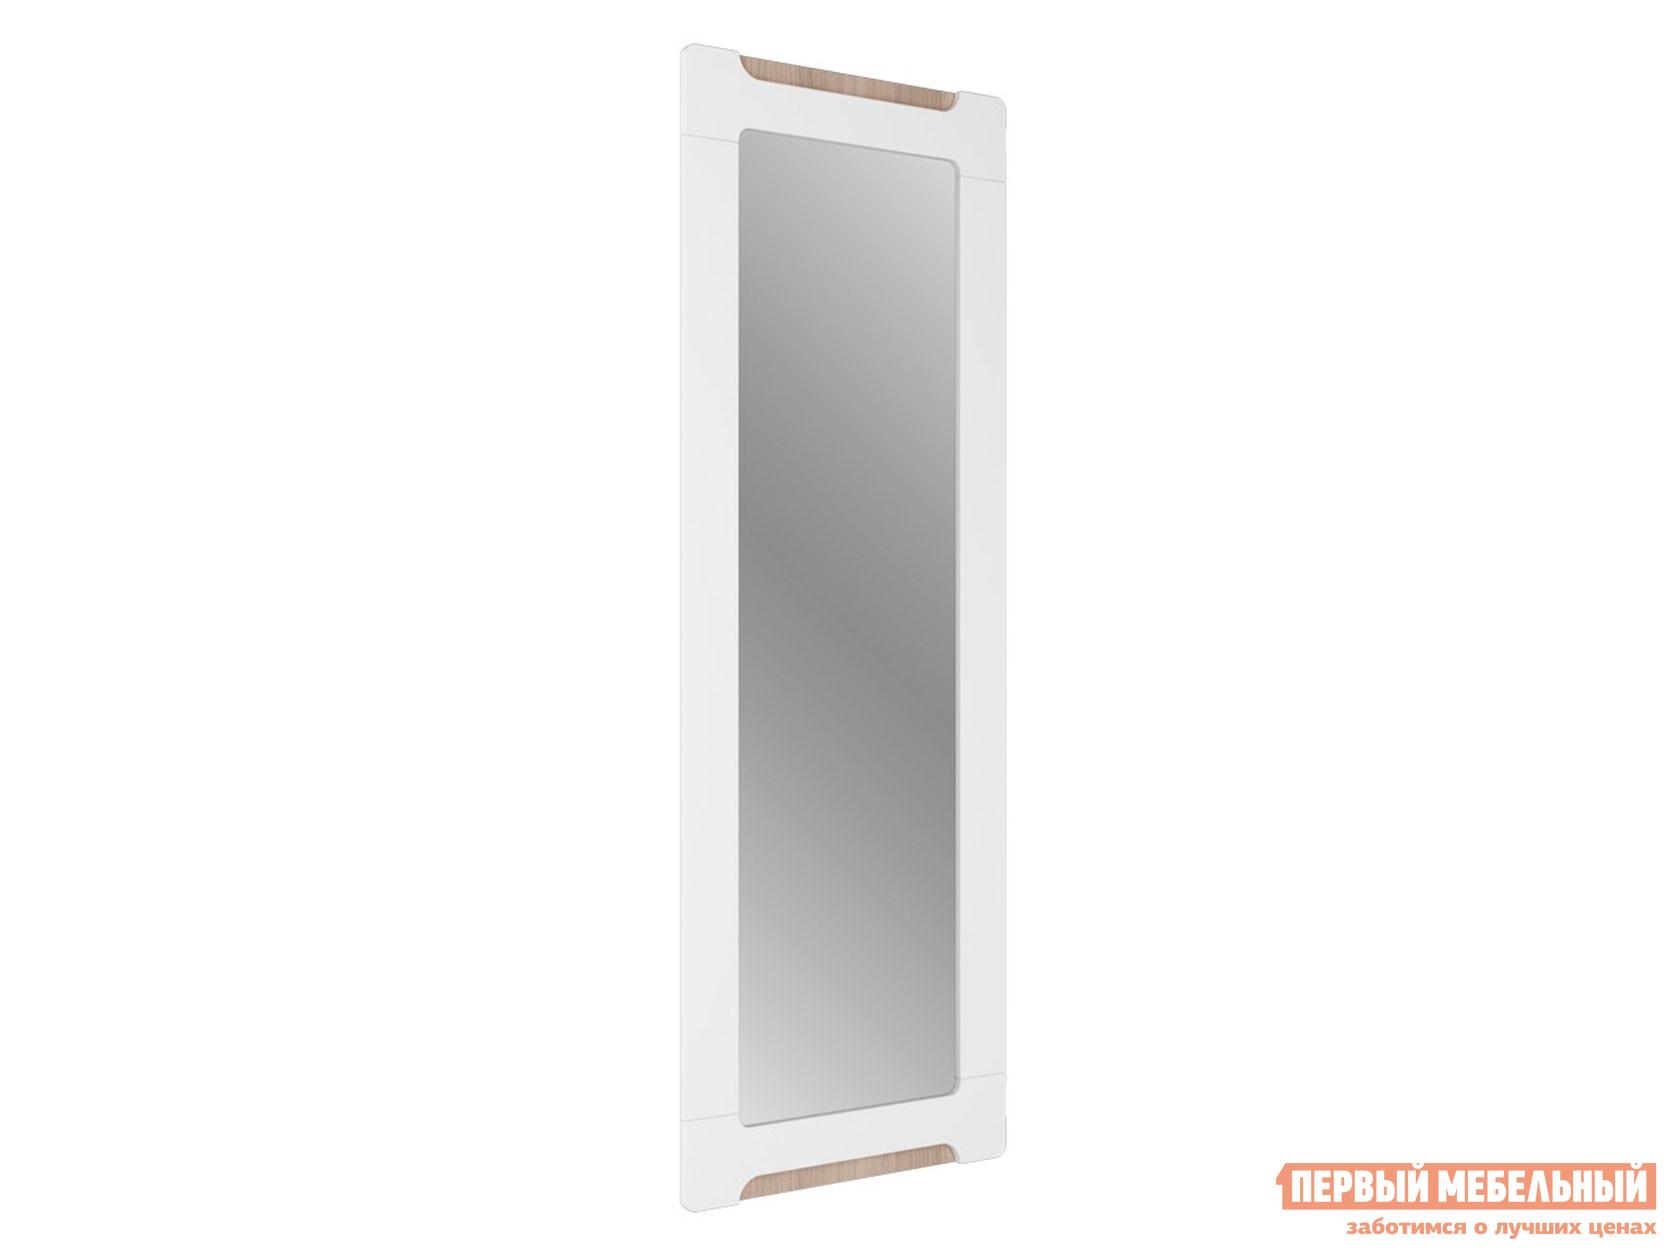 Настенное зеркало  Зеркало Палермо С11 Ясень Шимо Светлый / Белый глянец, Без опоры